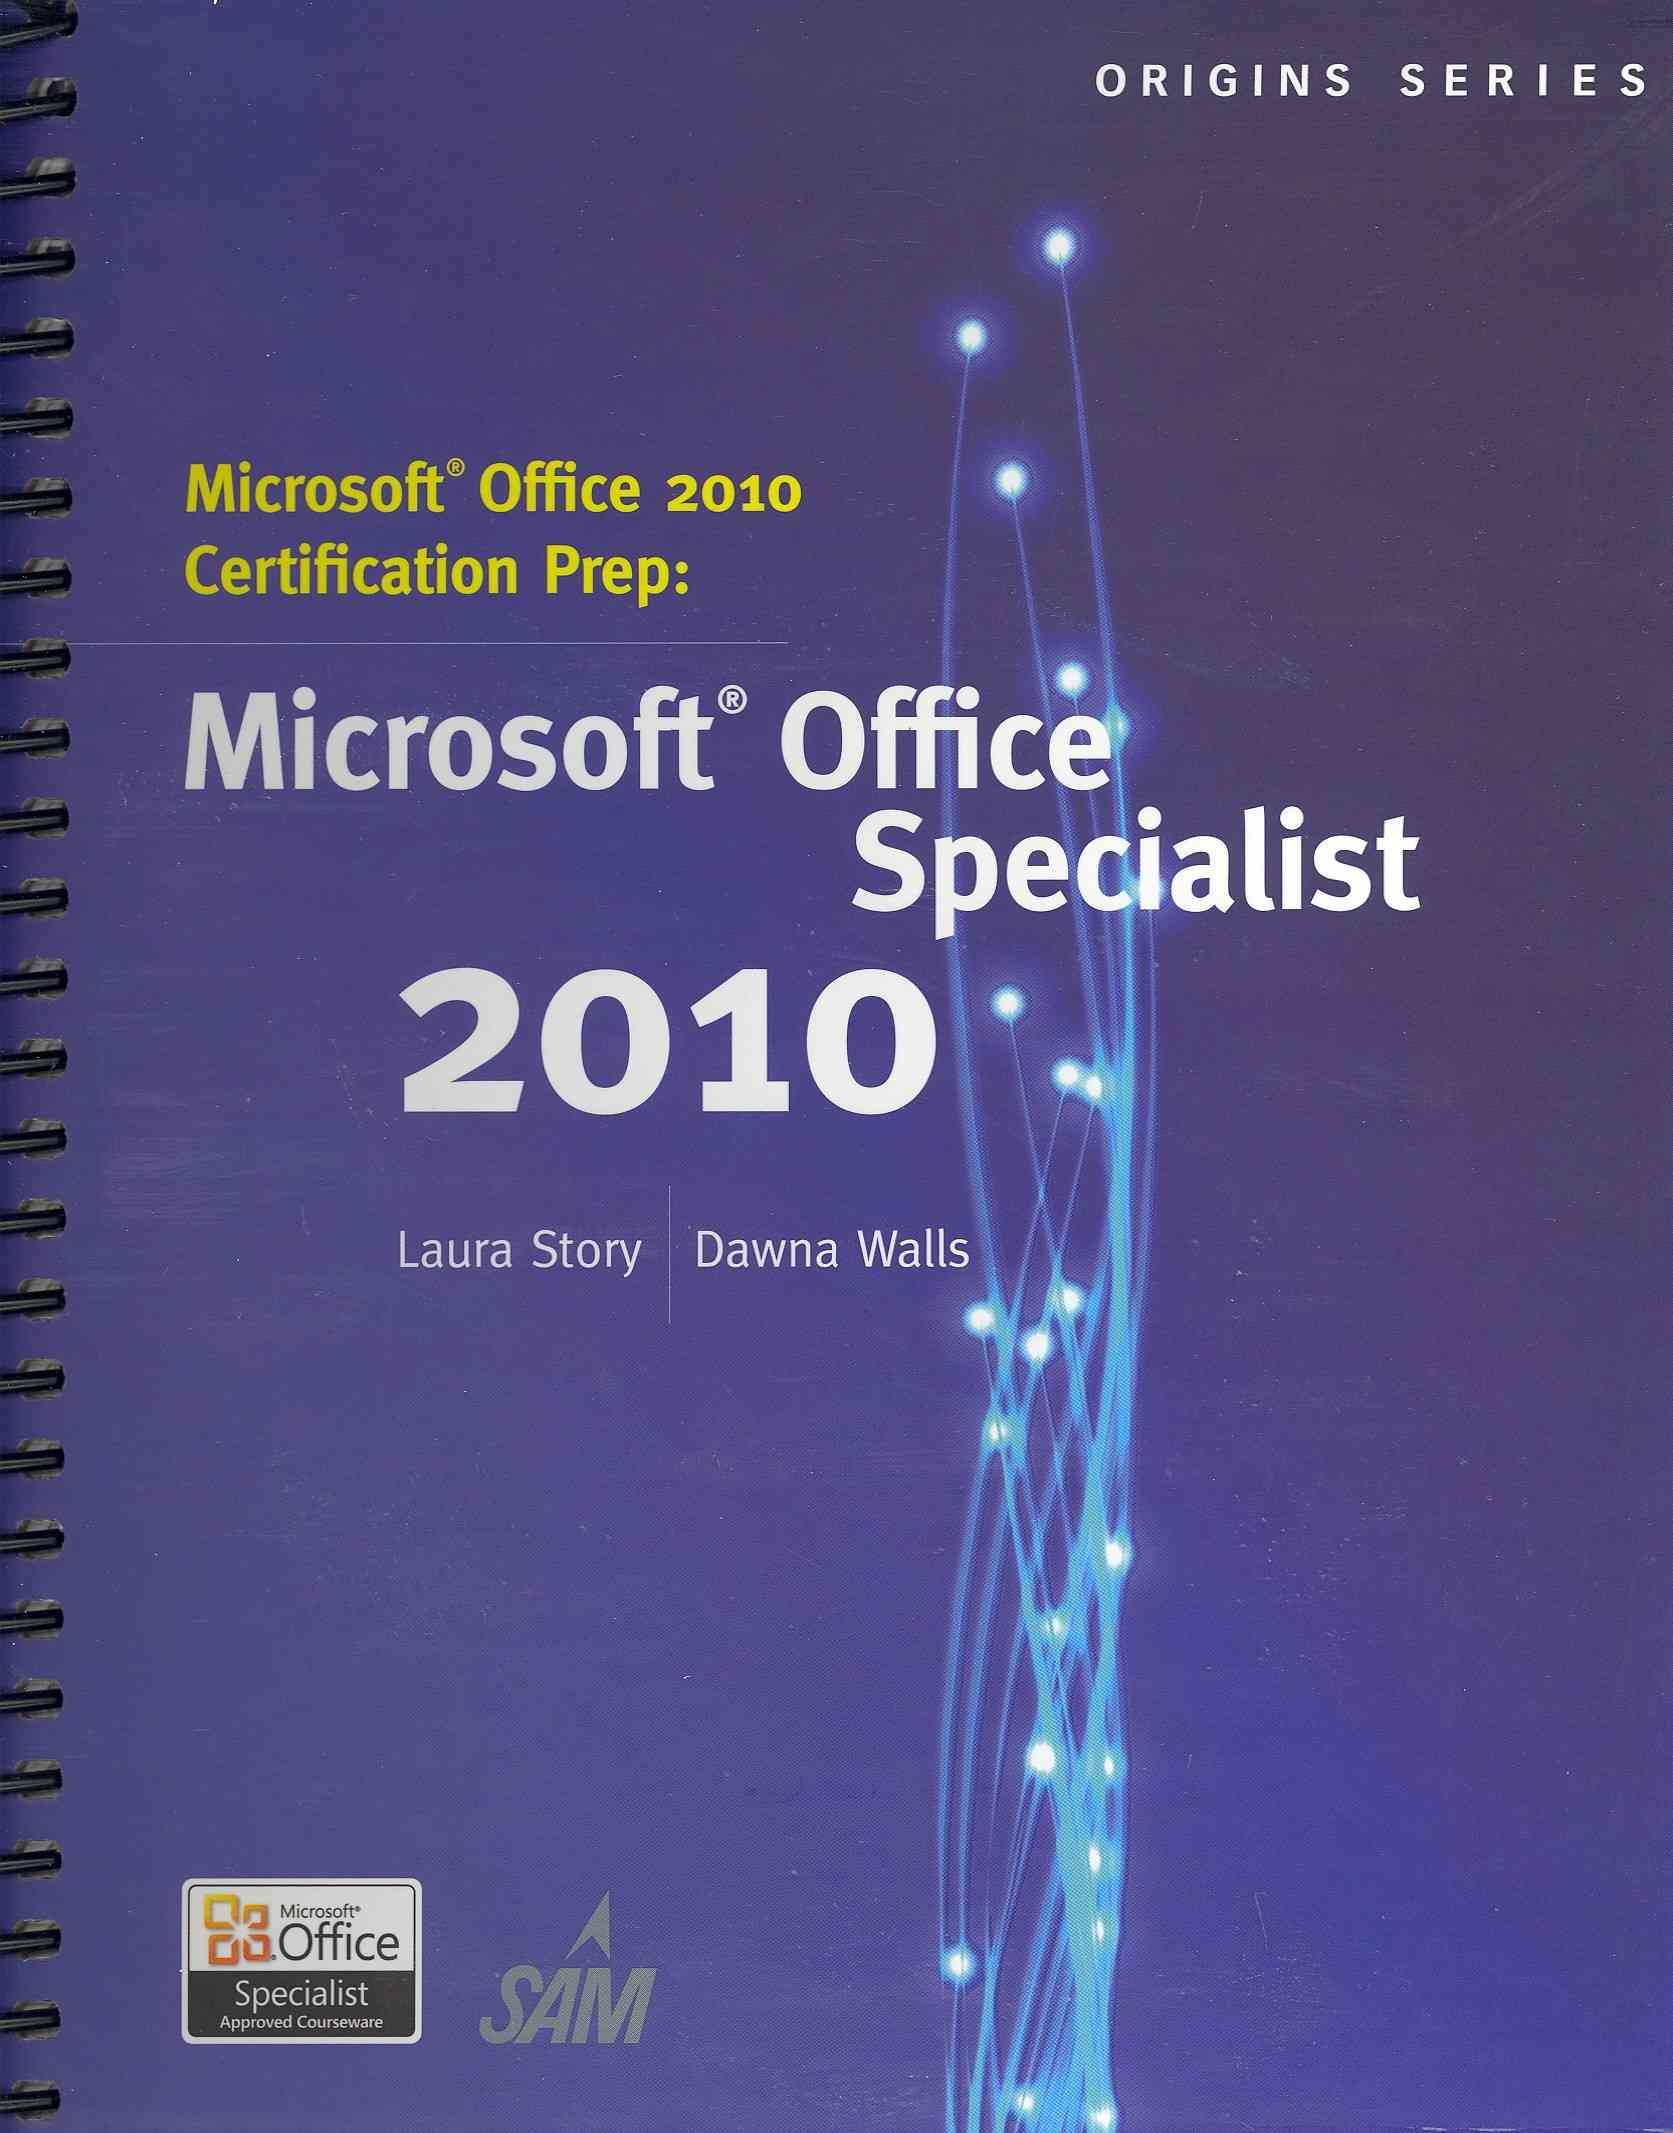 Microsoft Office 2010 Certification Prep: Microsoft Office Specialist 2010 (Spiral bound)